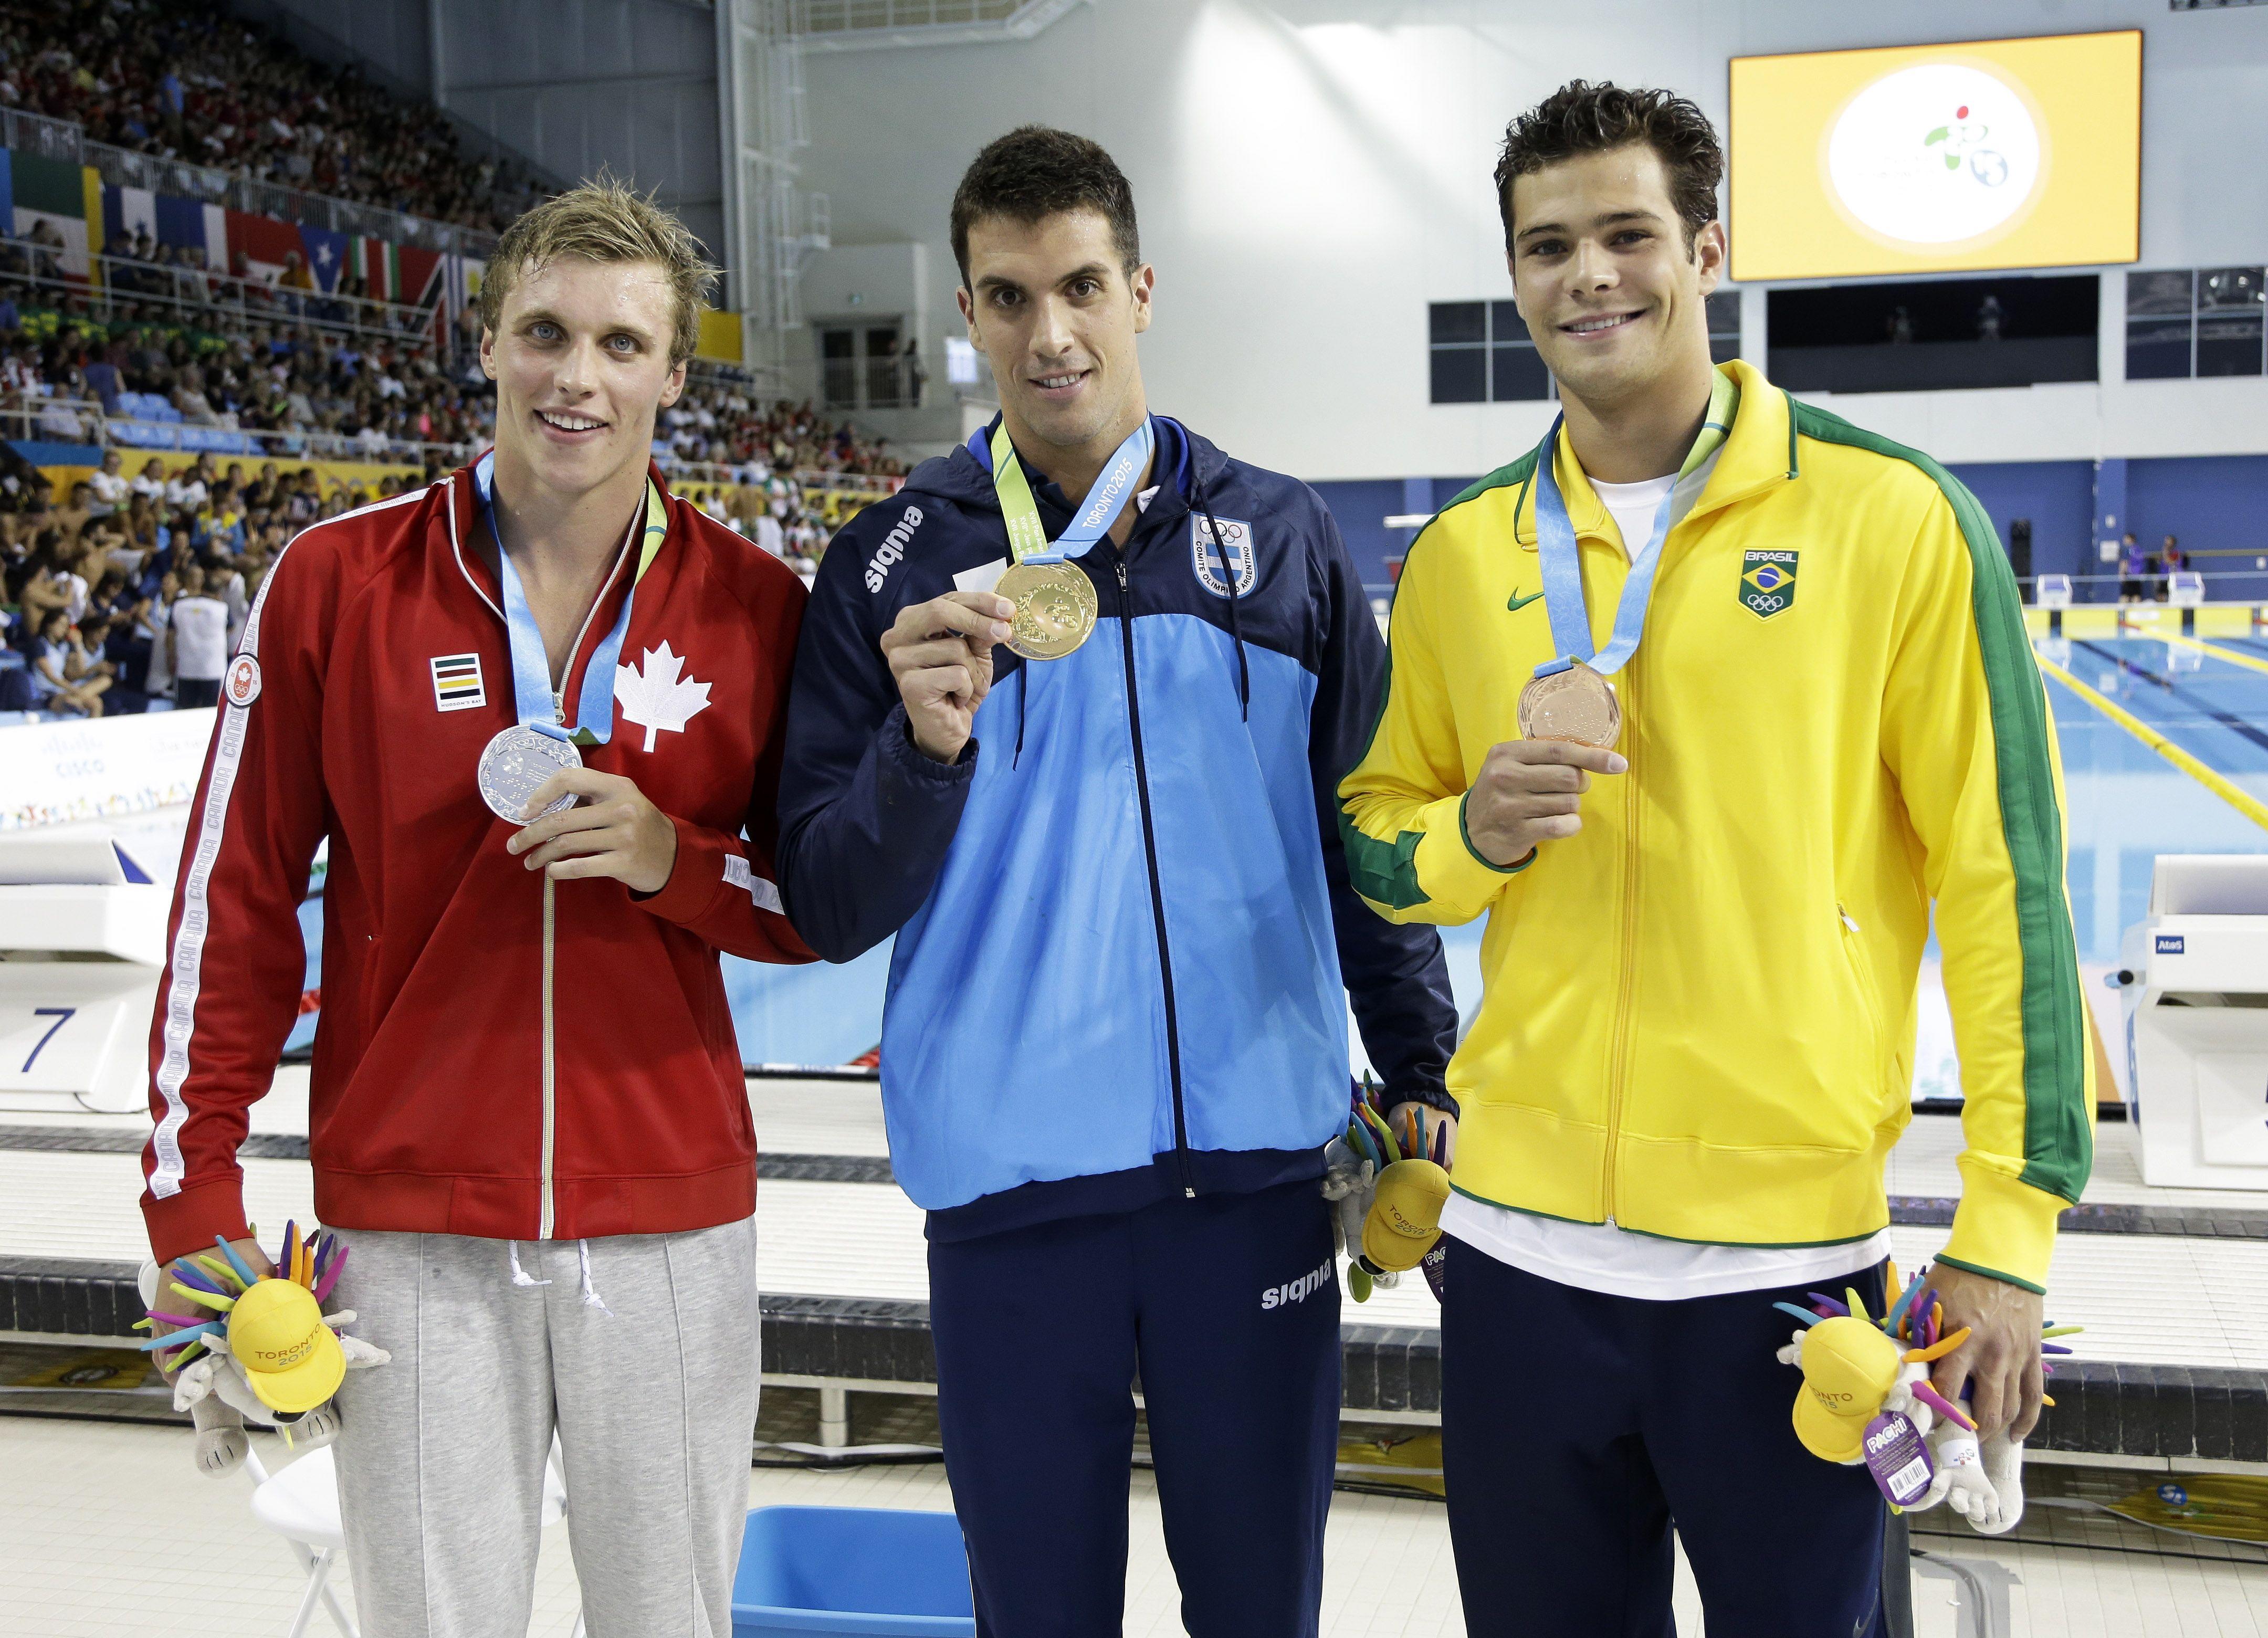 Panam: Entrenador vaticina éxitos para Argentina en natación